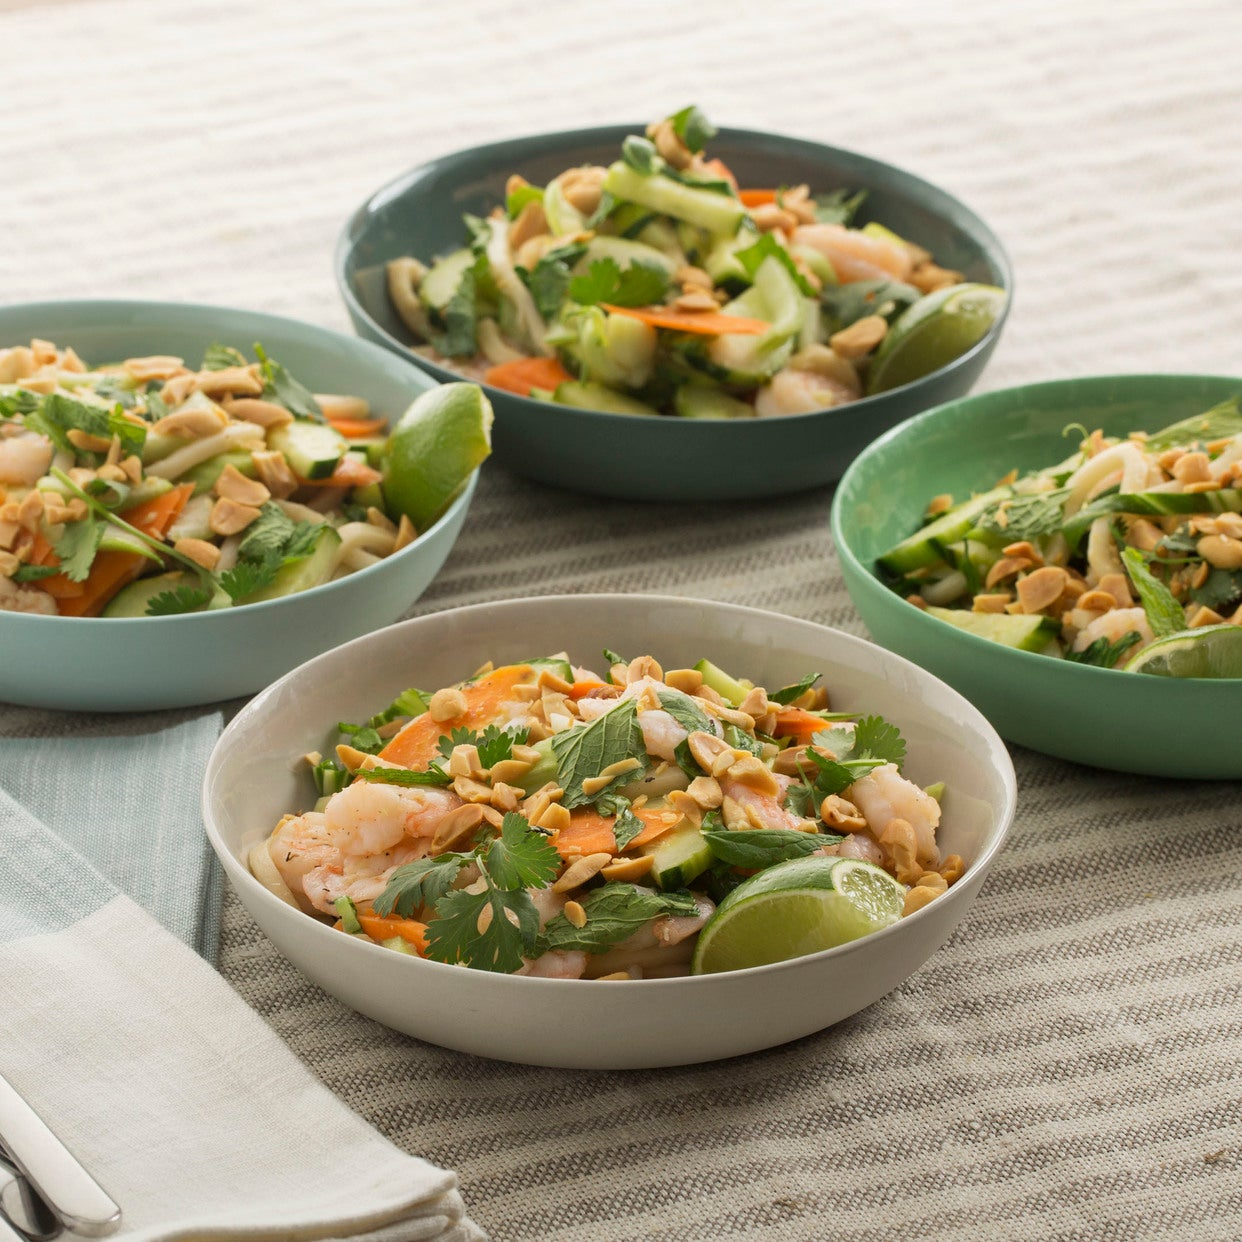 Shrimp & Udon Noodle Salad with Cucumber, Carrots & Baby Bok Choy